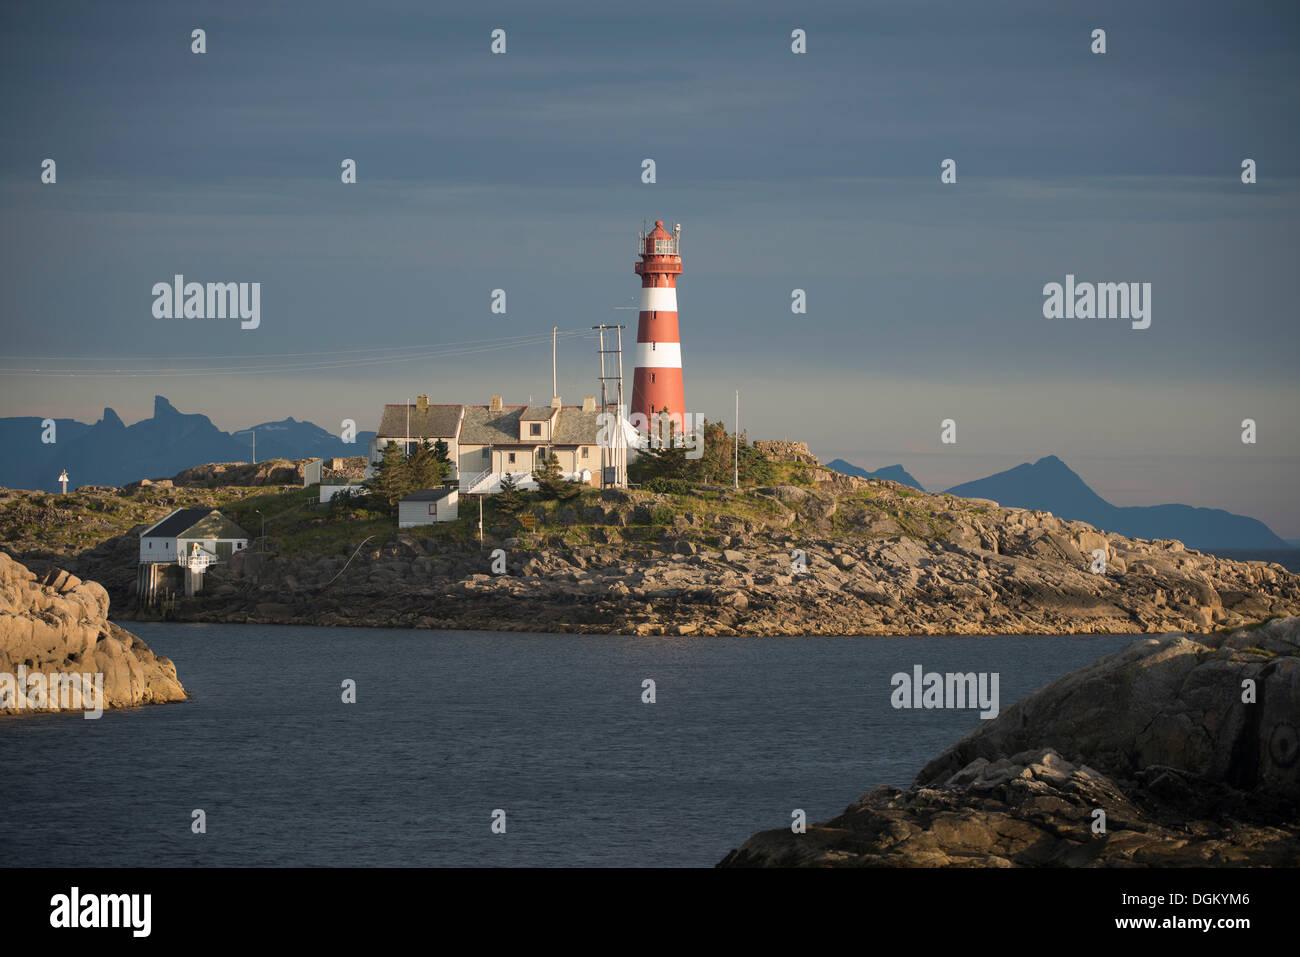 Lighthouse and buildings in the evening light, Ort und Inselgruppe Skrova, Gemeinde Vågan, Inselgruppe Lofoten,, Nordland - Stock Image